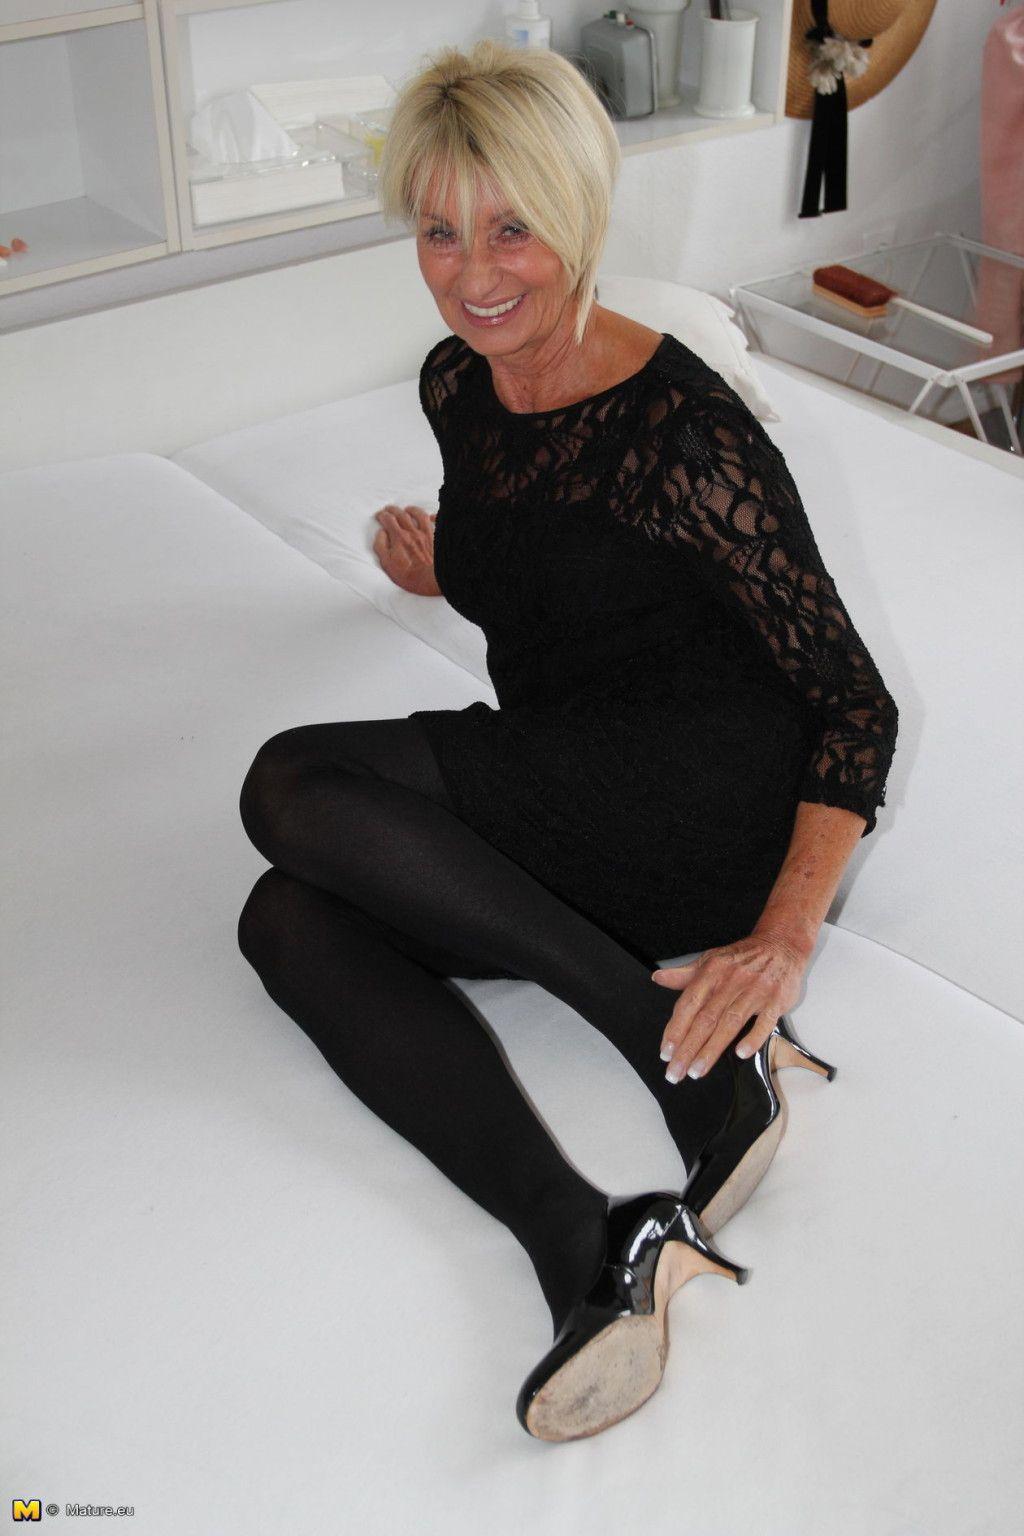 German housewife franziska acquires smoking bawdy at XXXSexPic